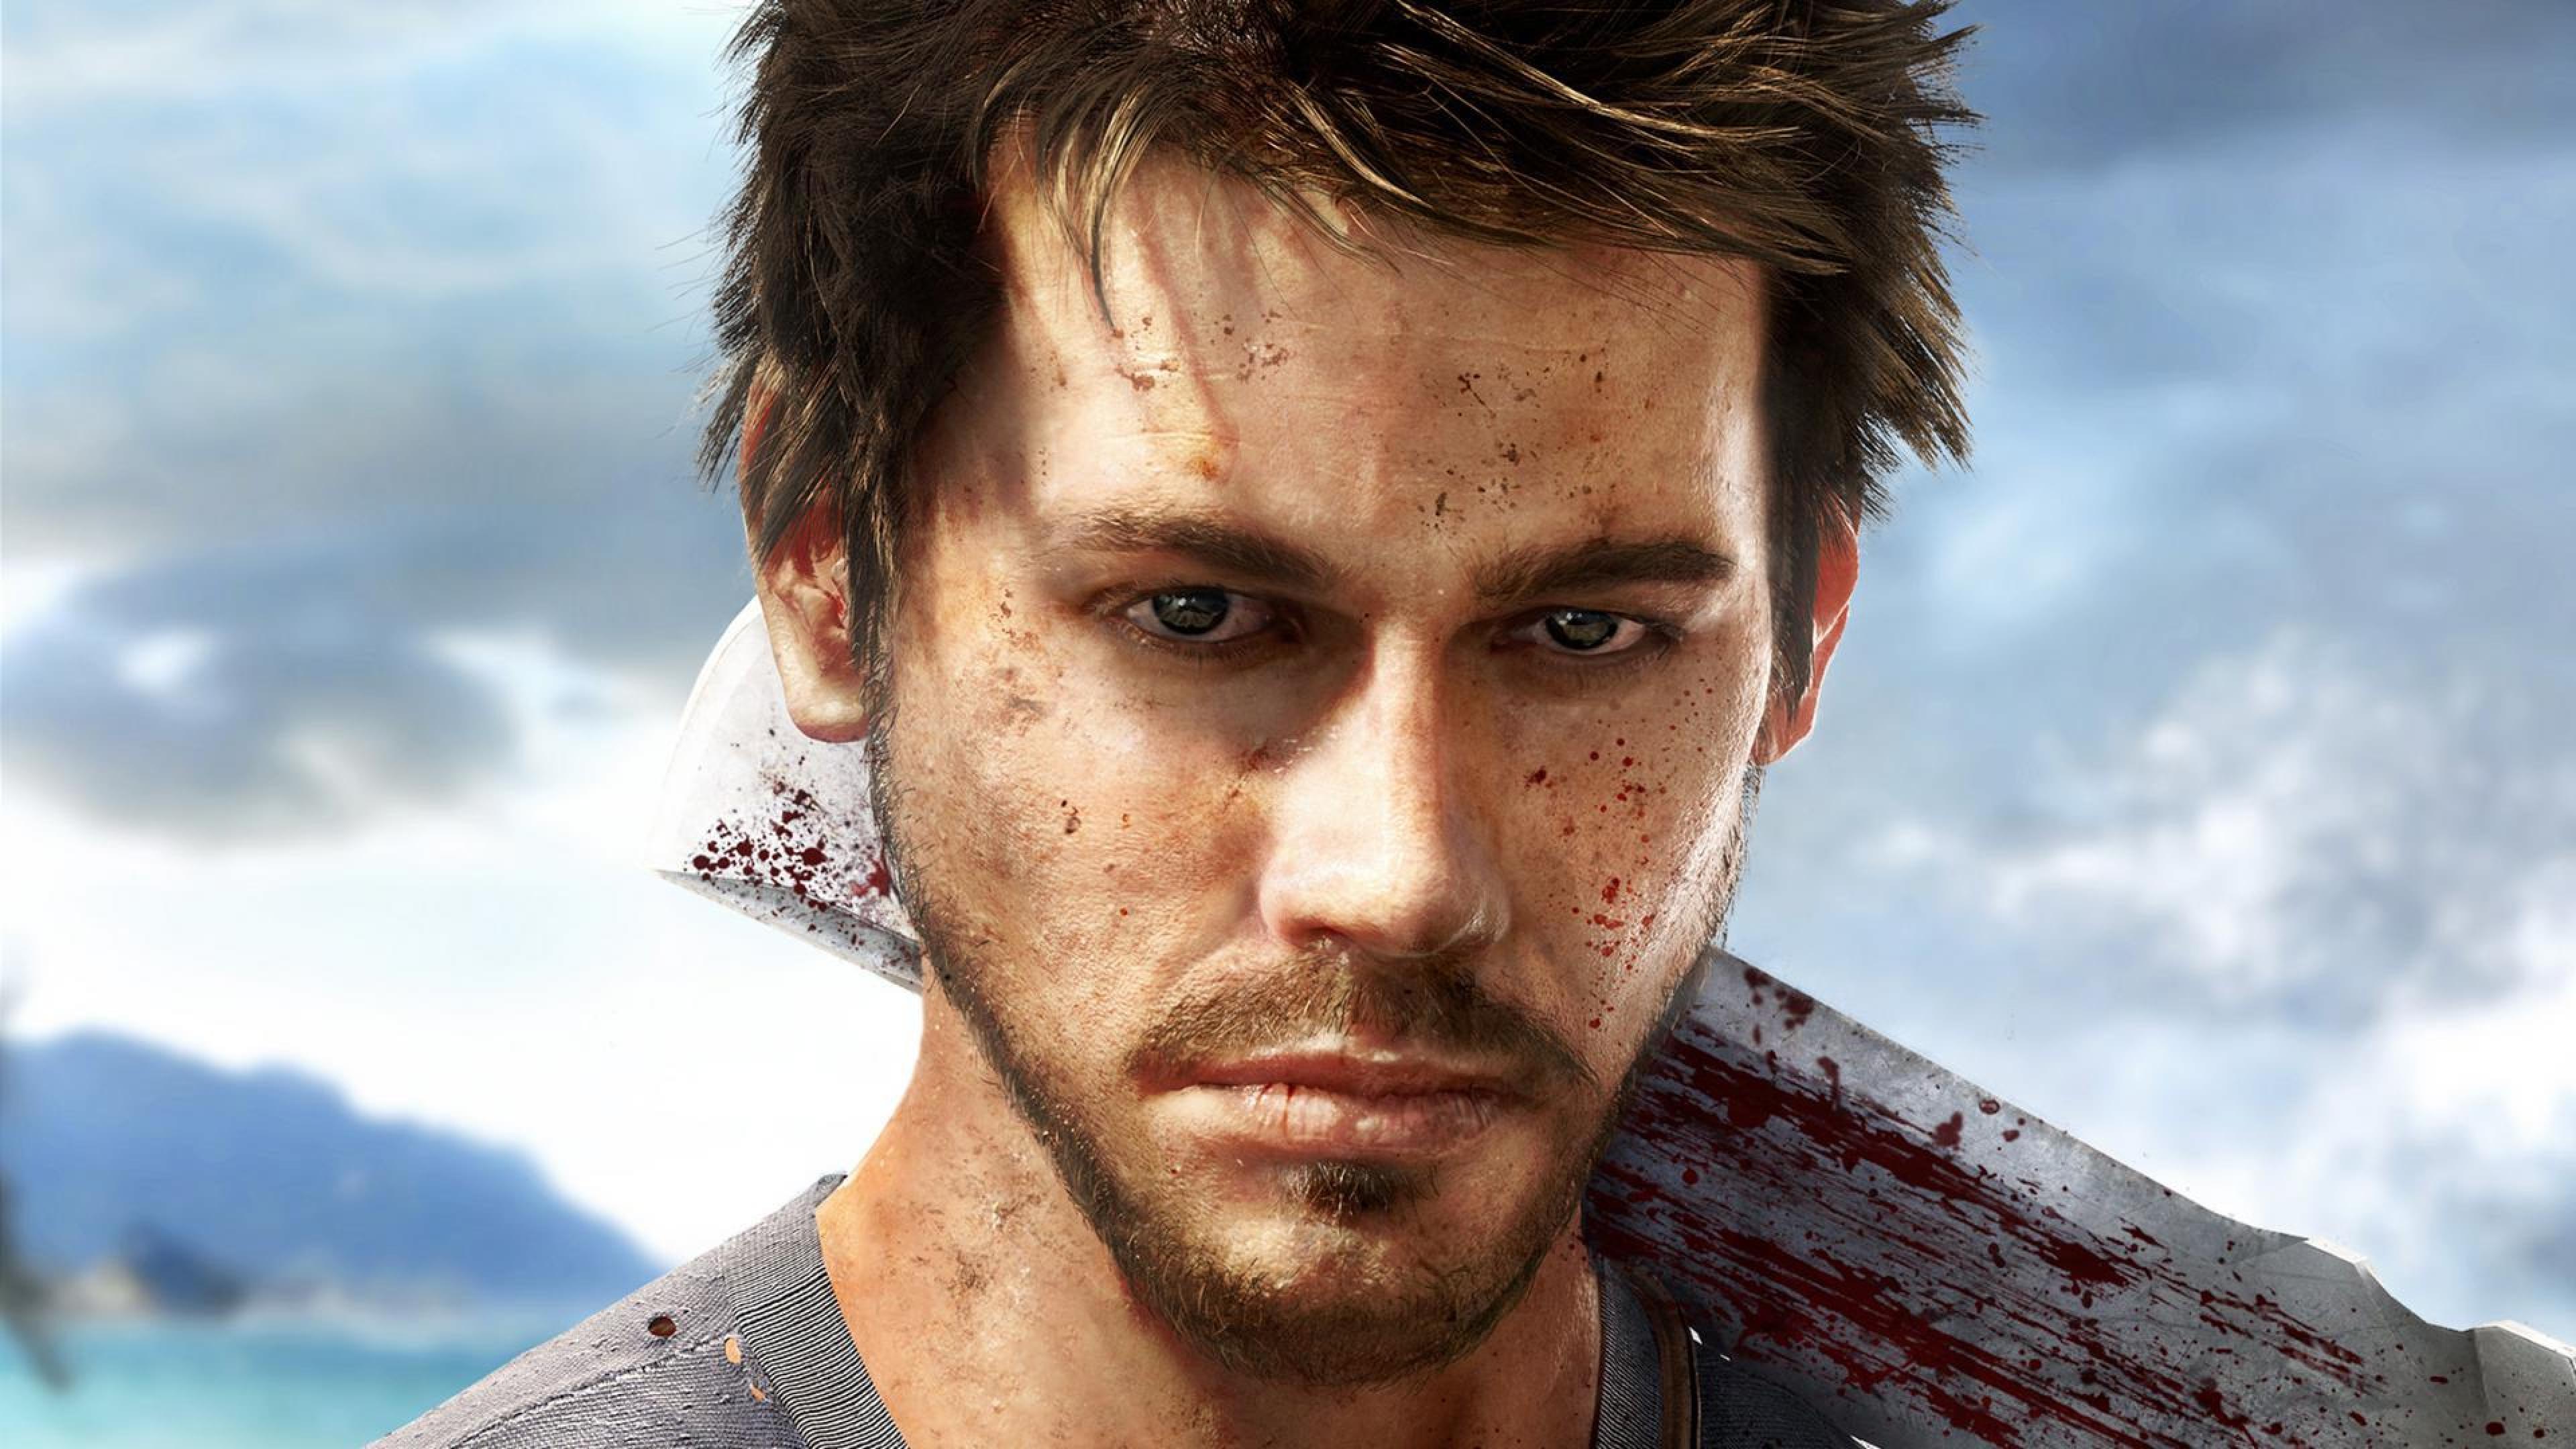 3840x2160 Far Cry 3 Jason Brody Weapons 4k Wallpaper Hd Games